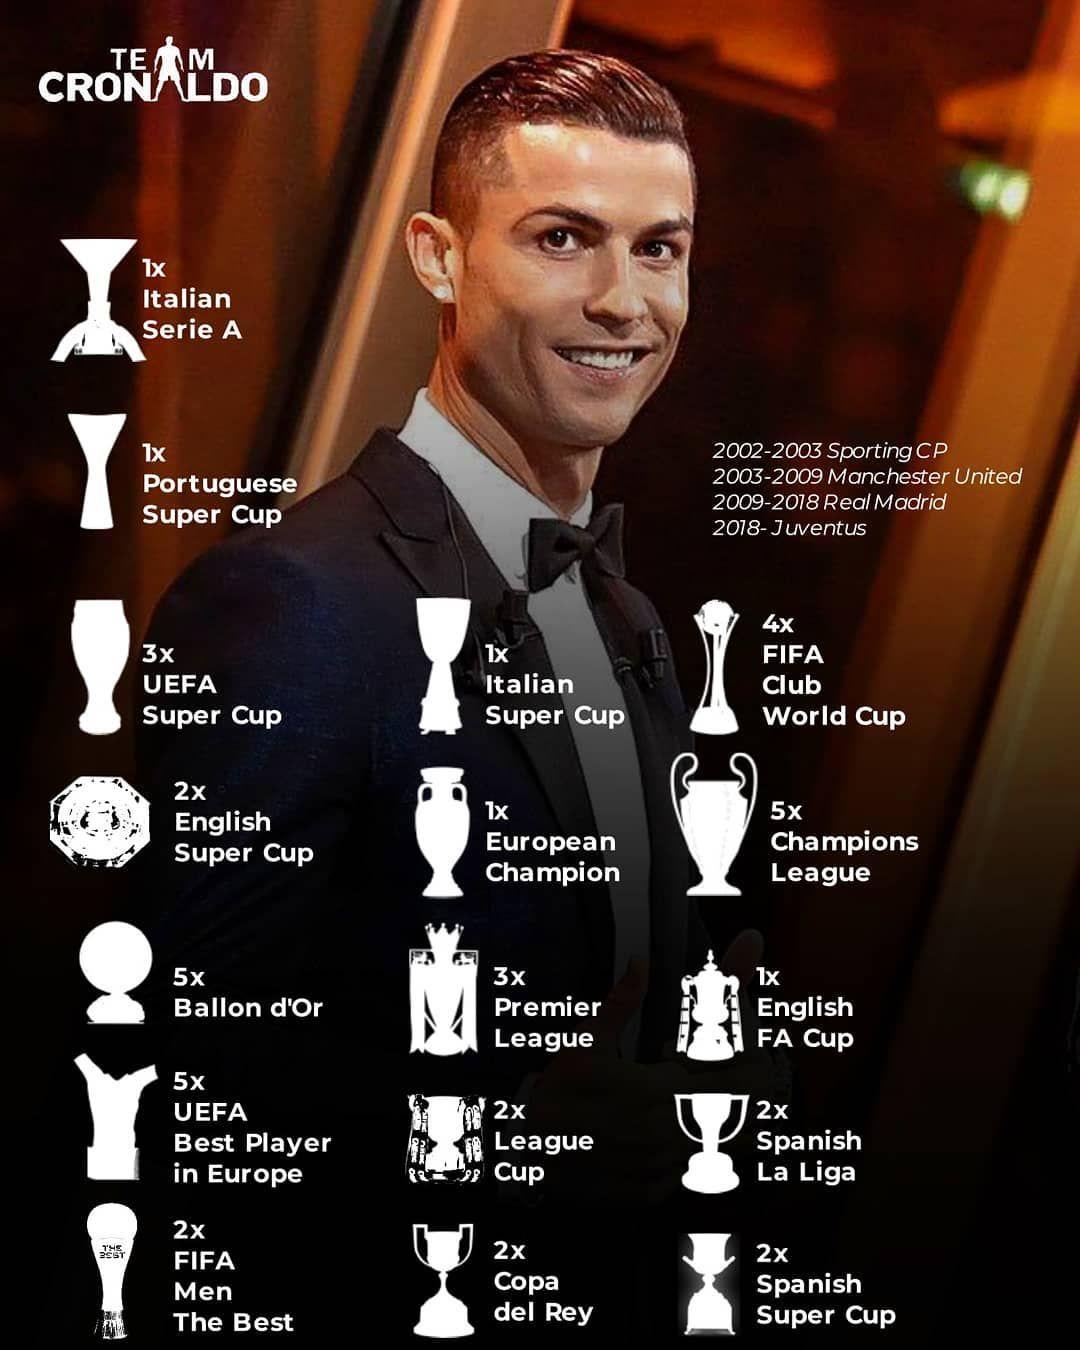 Cristiano Ronaldo trophies and awards won. Born a winner 🏆🏅🔥 . . Follow @teamcronaldo for m…   Ronaldo junior, Cristiano ronaldo junior, Cristiano ronaldo goals